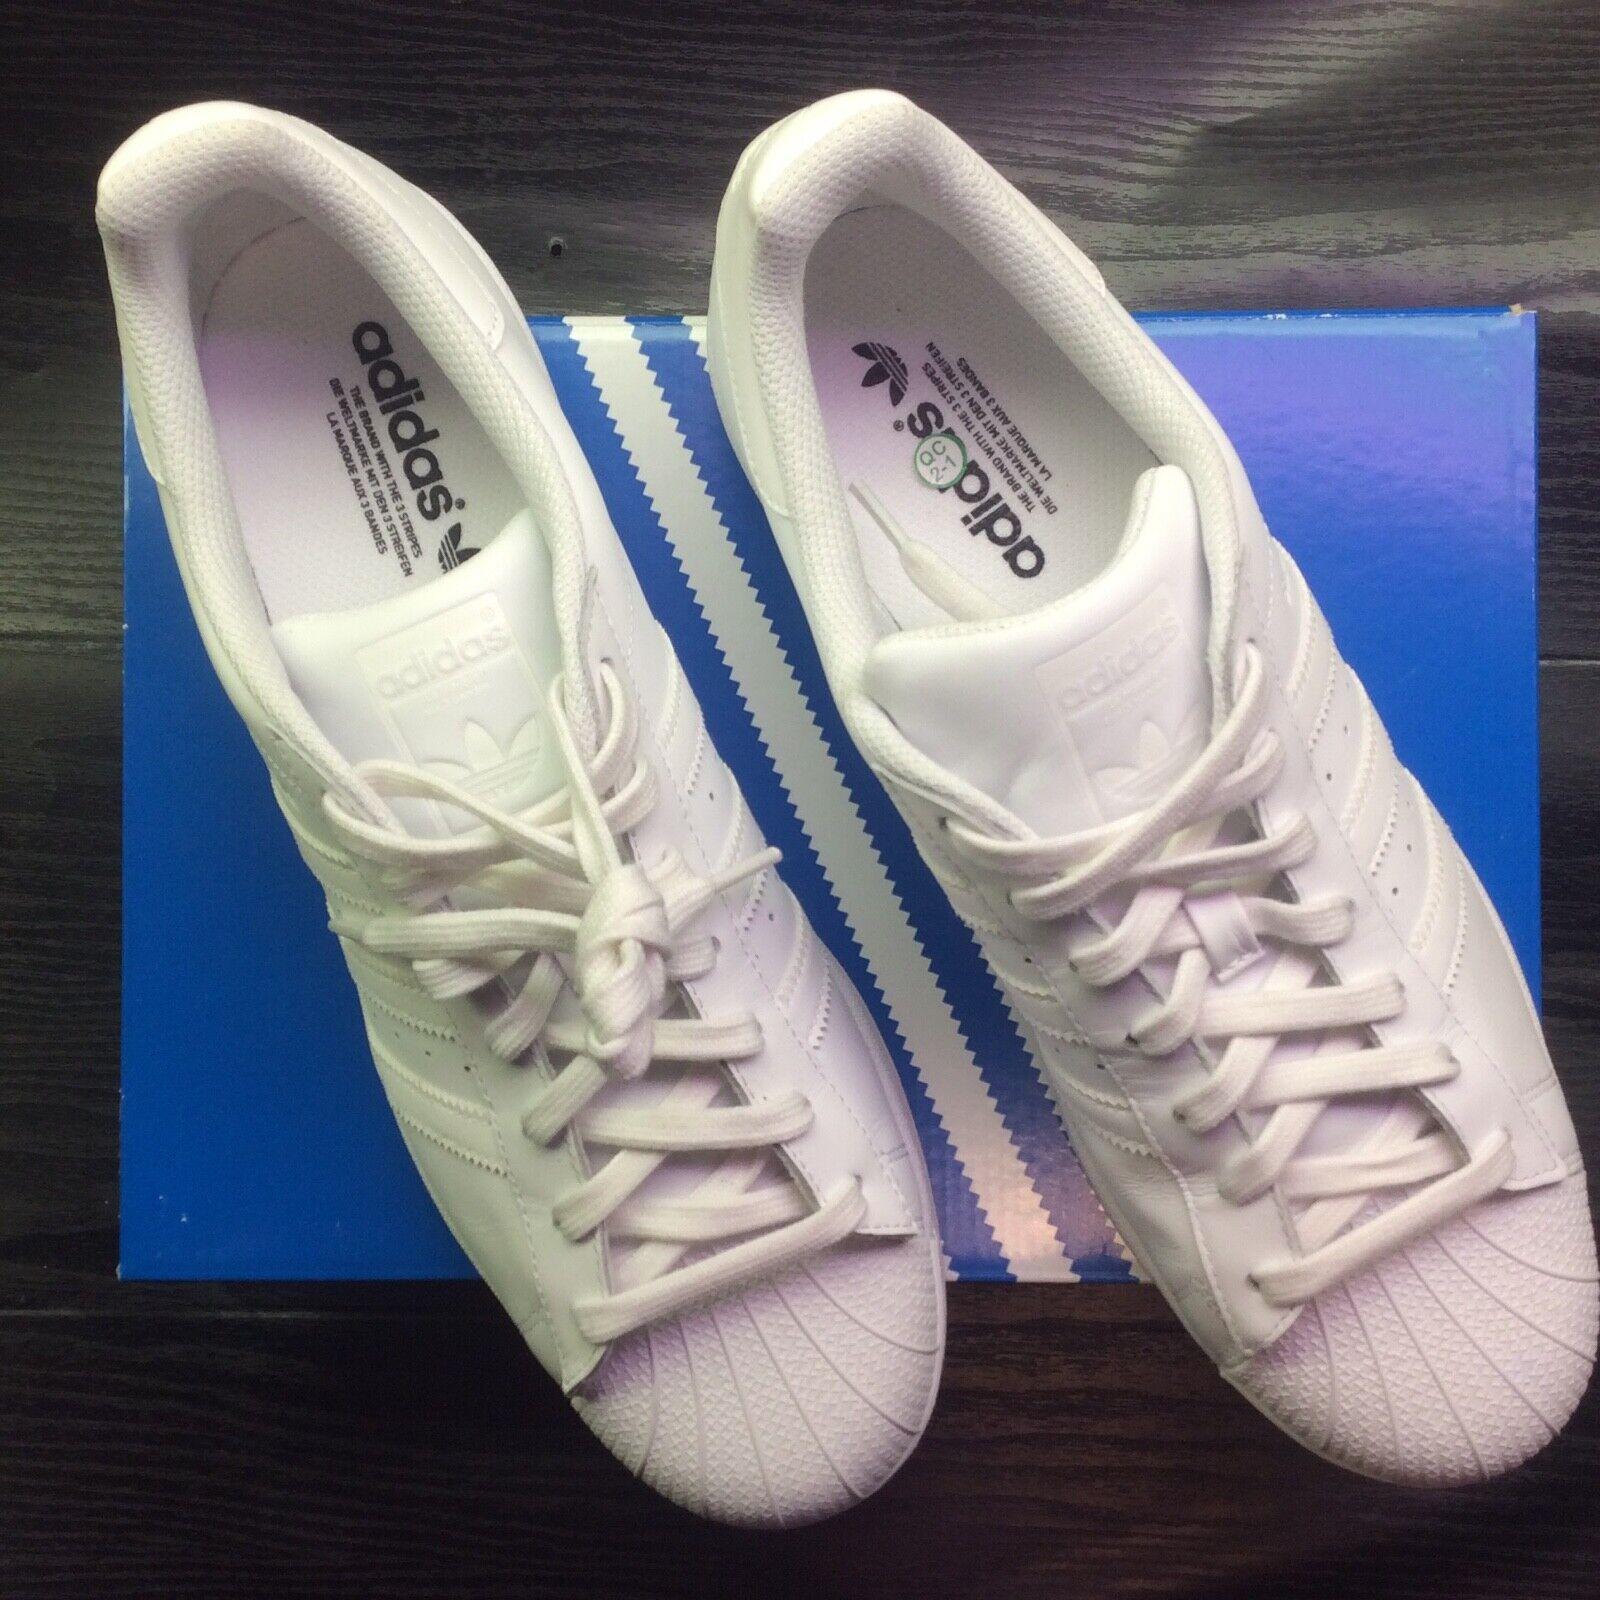 Adidas Superstar triple white US 12 worn twice includes Box